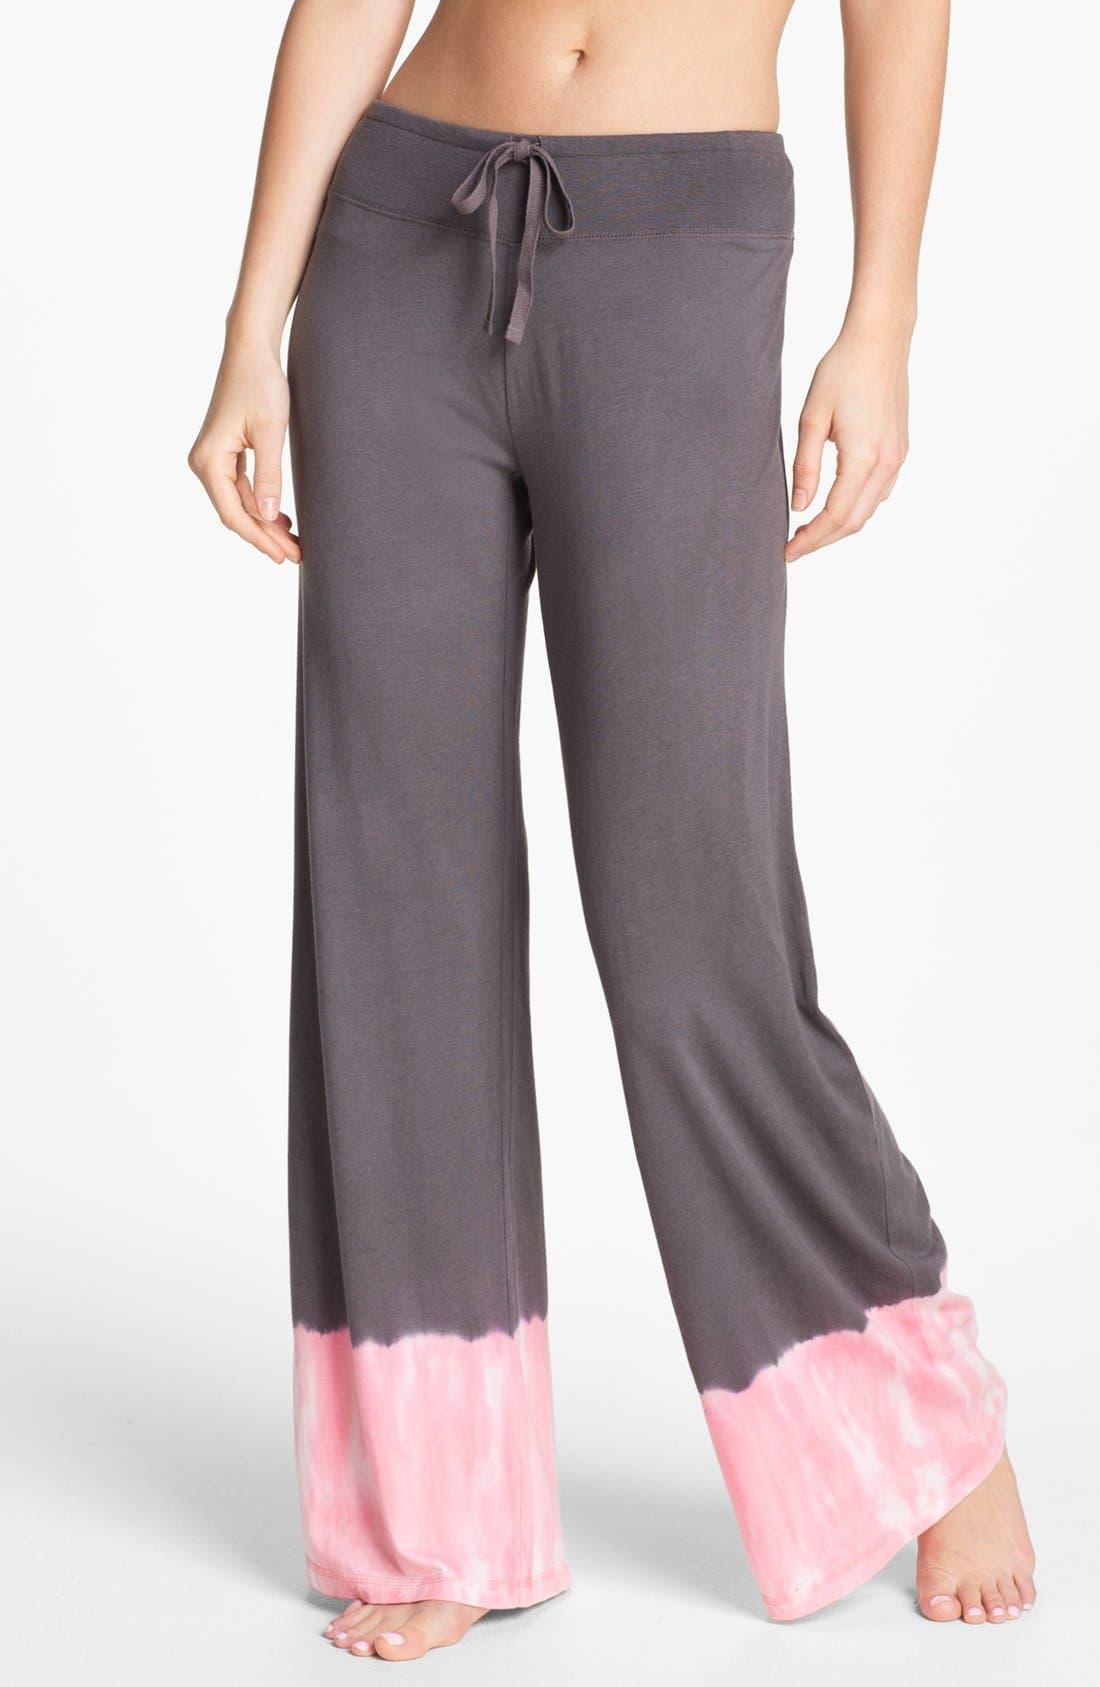 Alternate Image 1 Selected - PJ Salvage 'Pink Dyes' Palazzo Pants